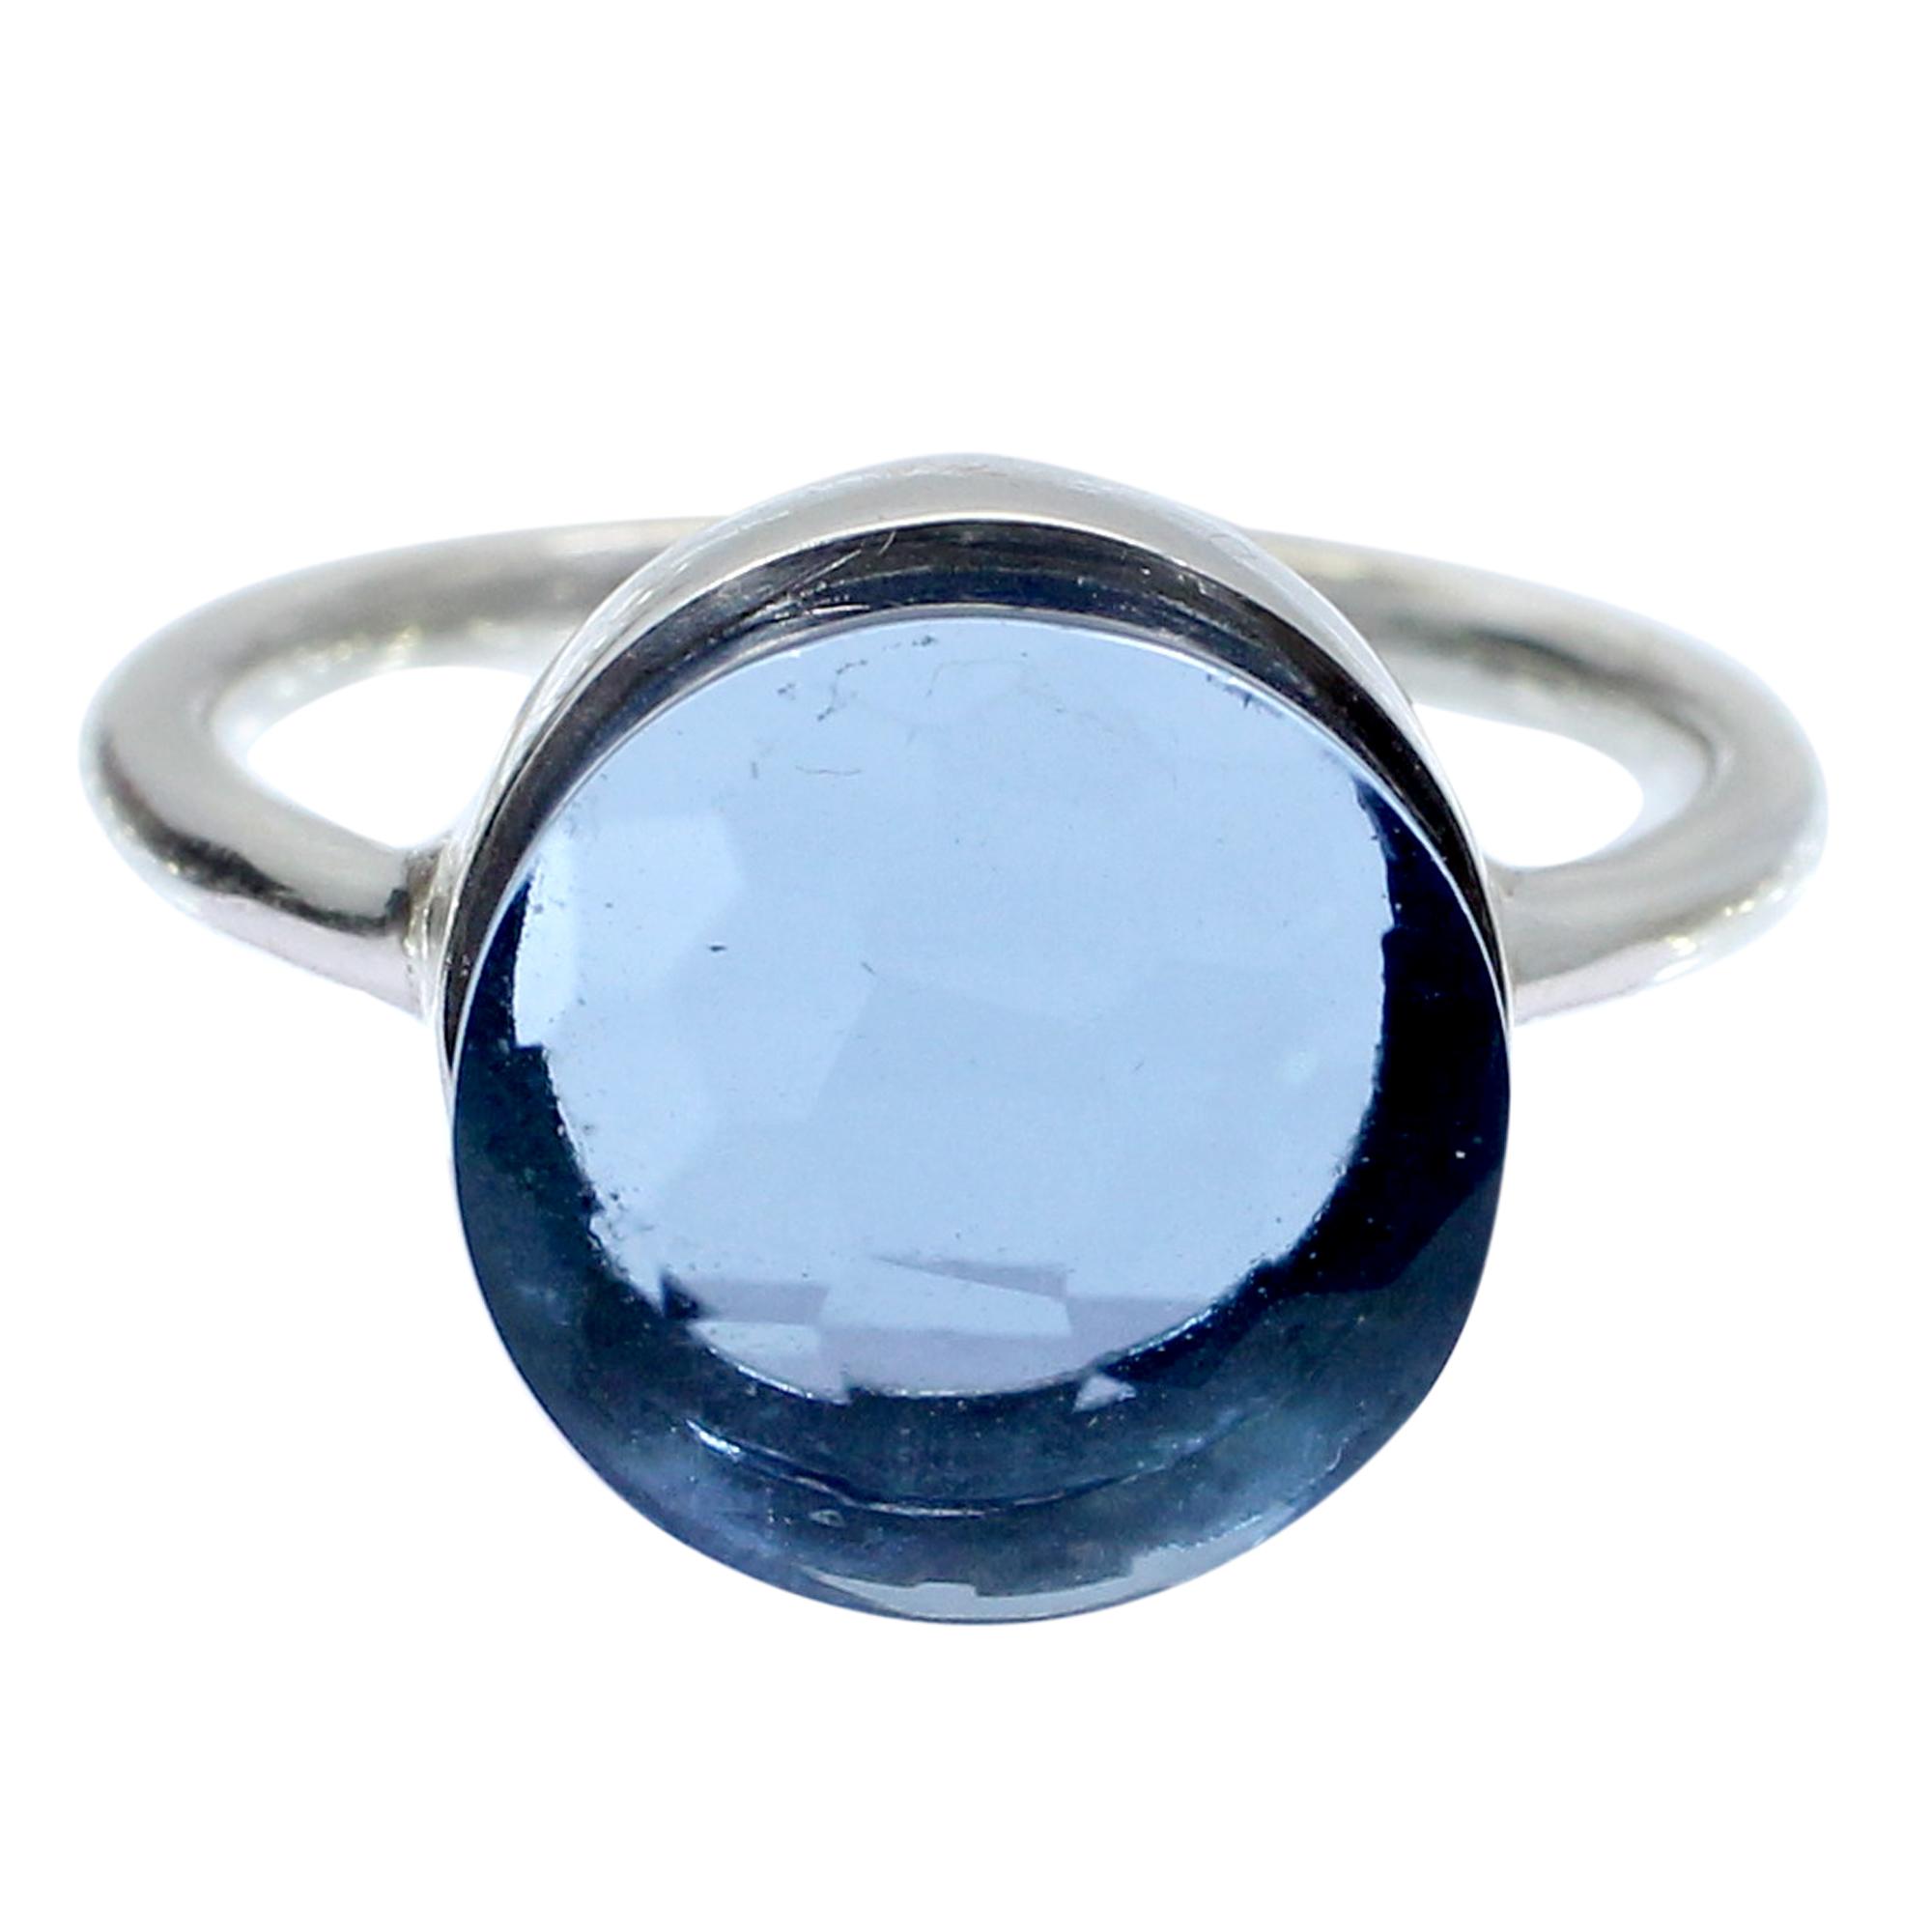 London Blue Topaz Hydro 925 Sterling Silver Handmade Bezel Set Simple Ring